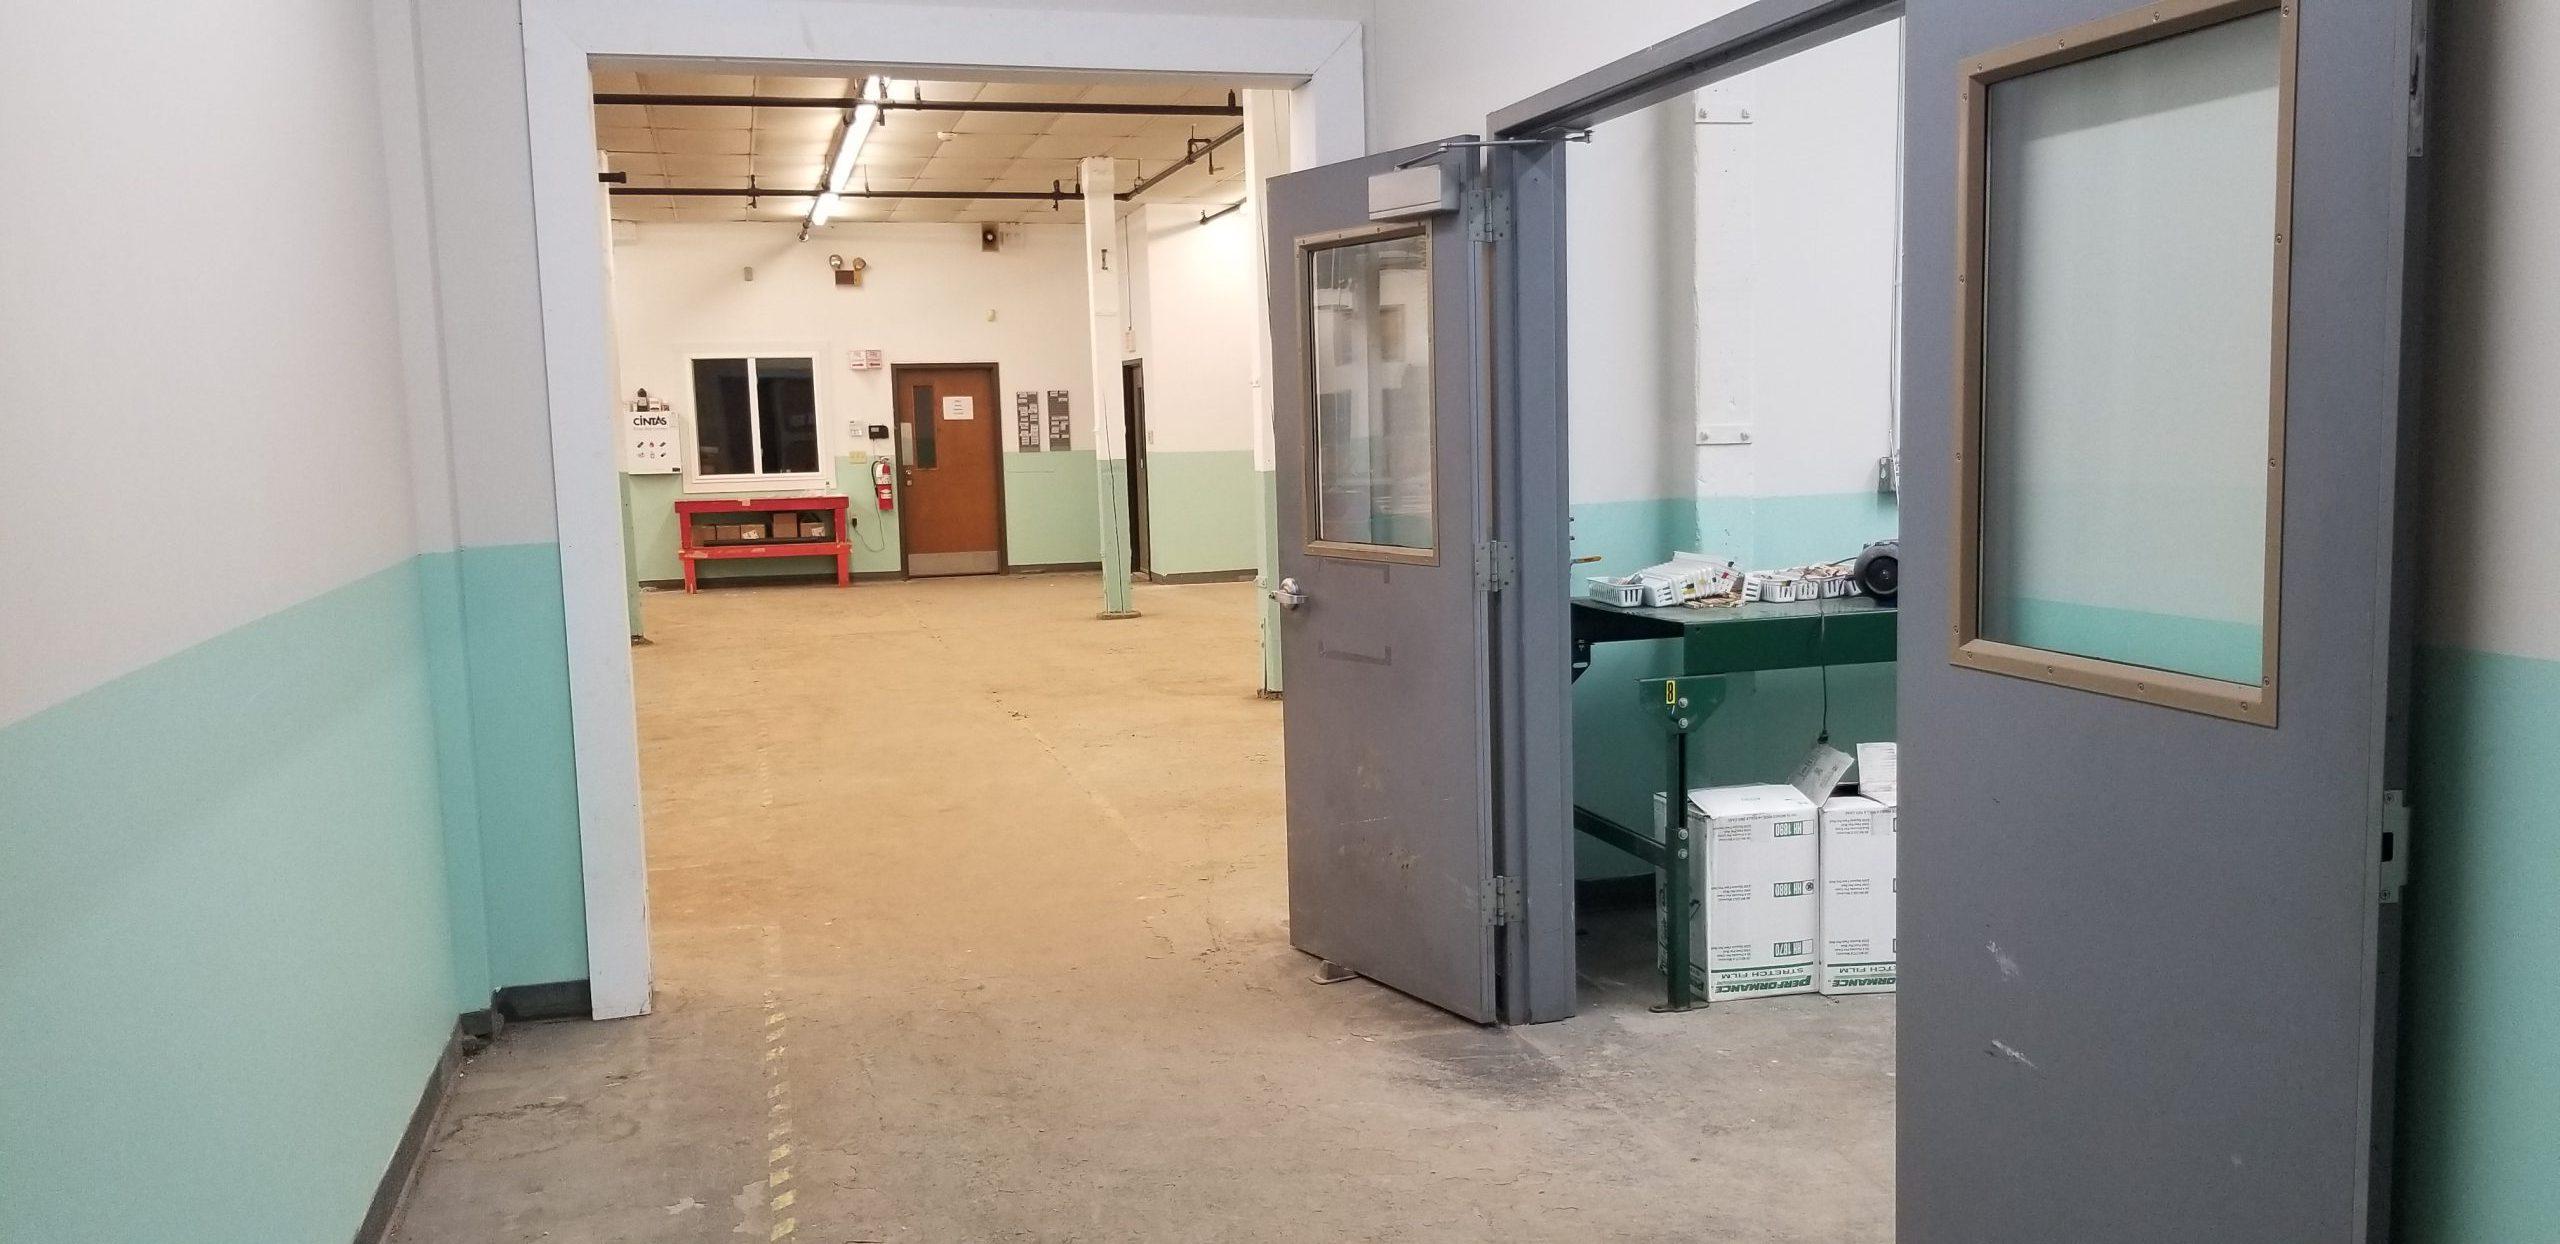 Bldg. 609 Production Office Area